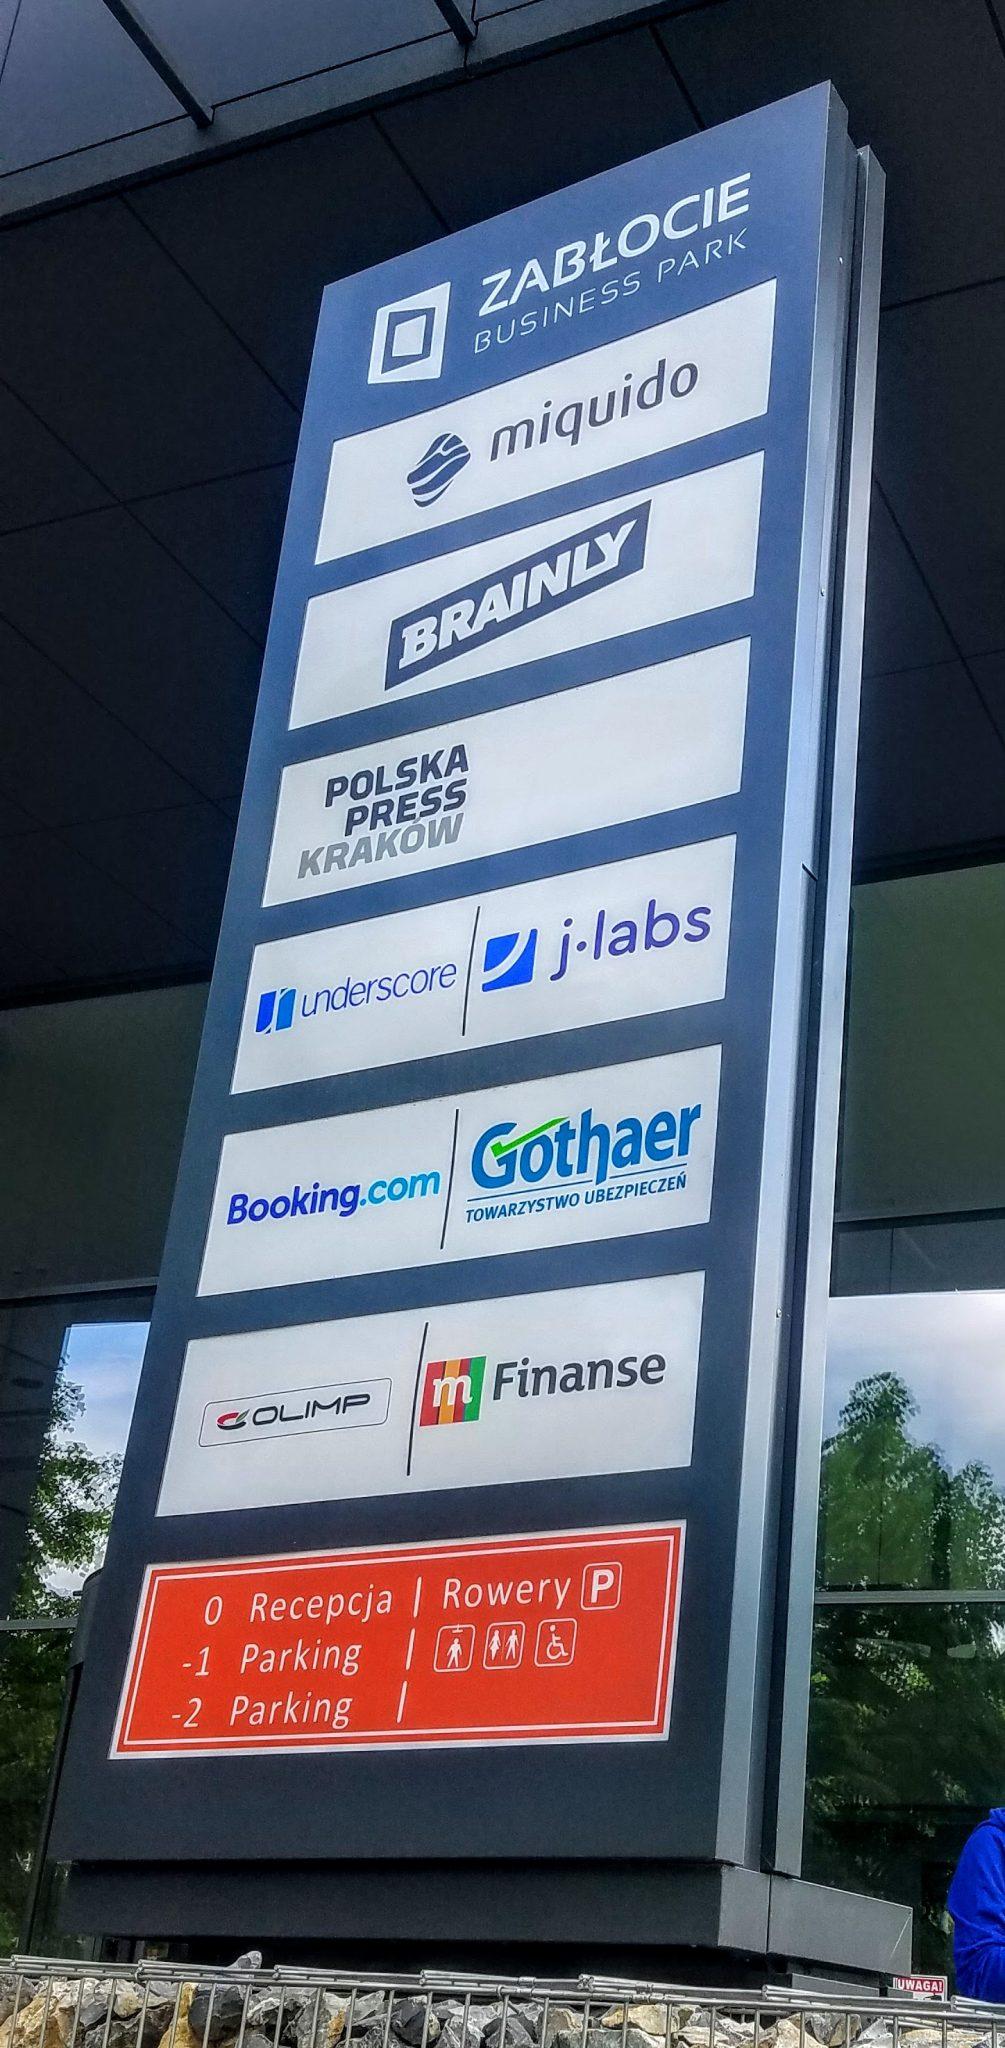 Krakow's bigger technology companies flock to Zablocie